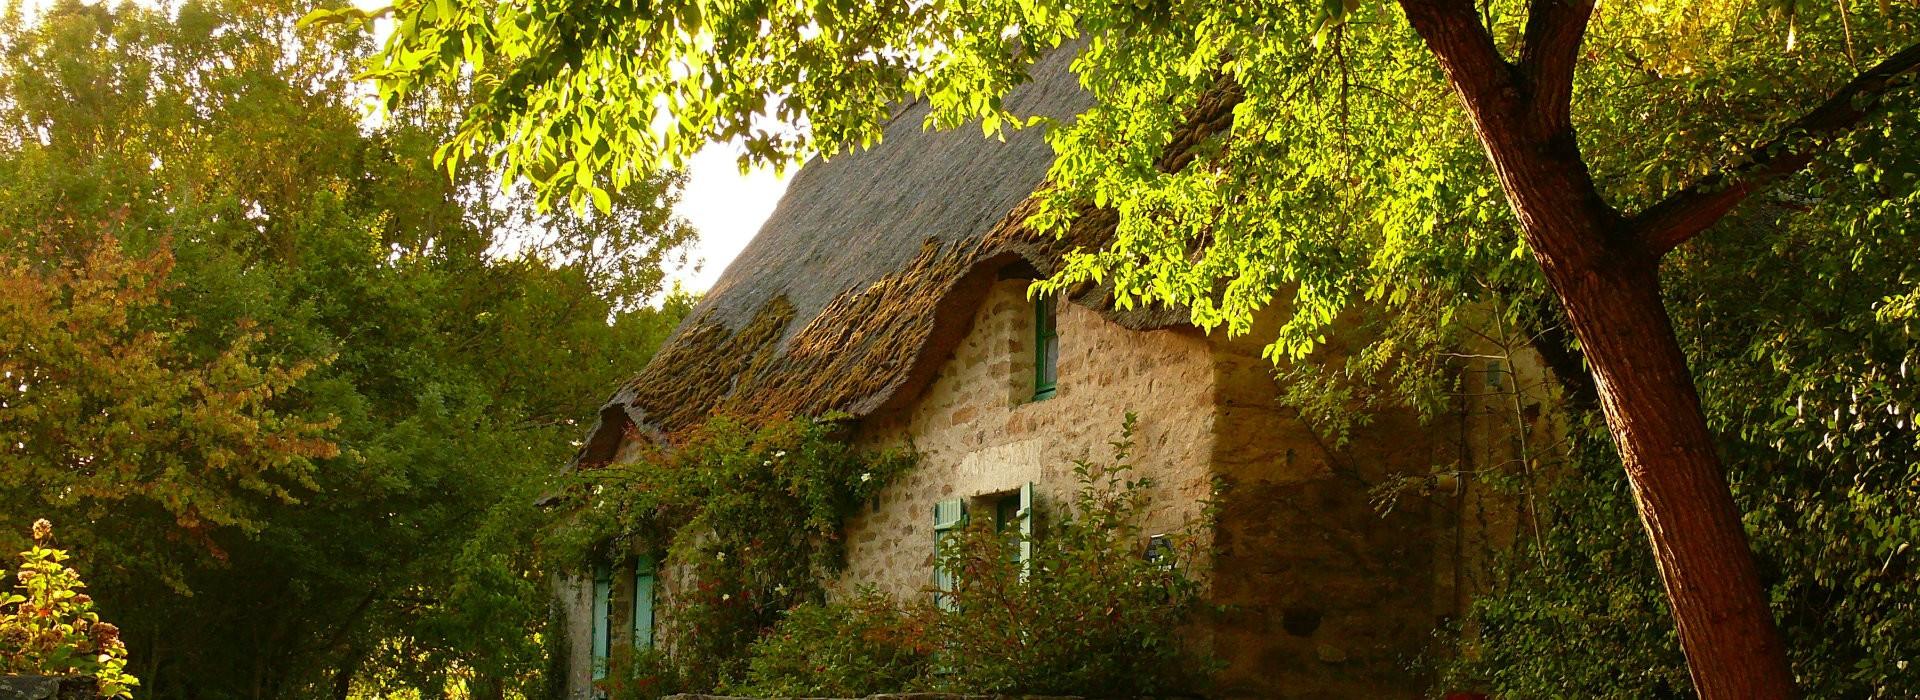 Où dormir à Saint-Lyphard - Bruno Schoch